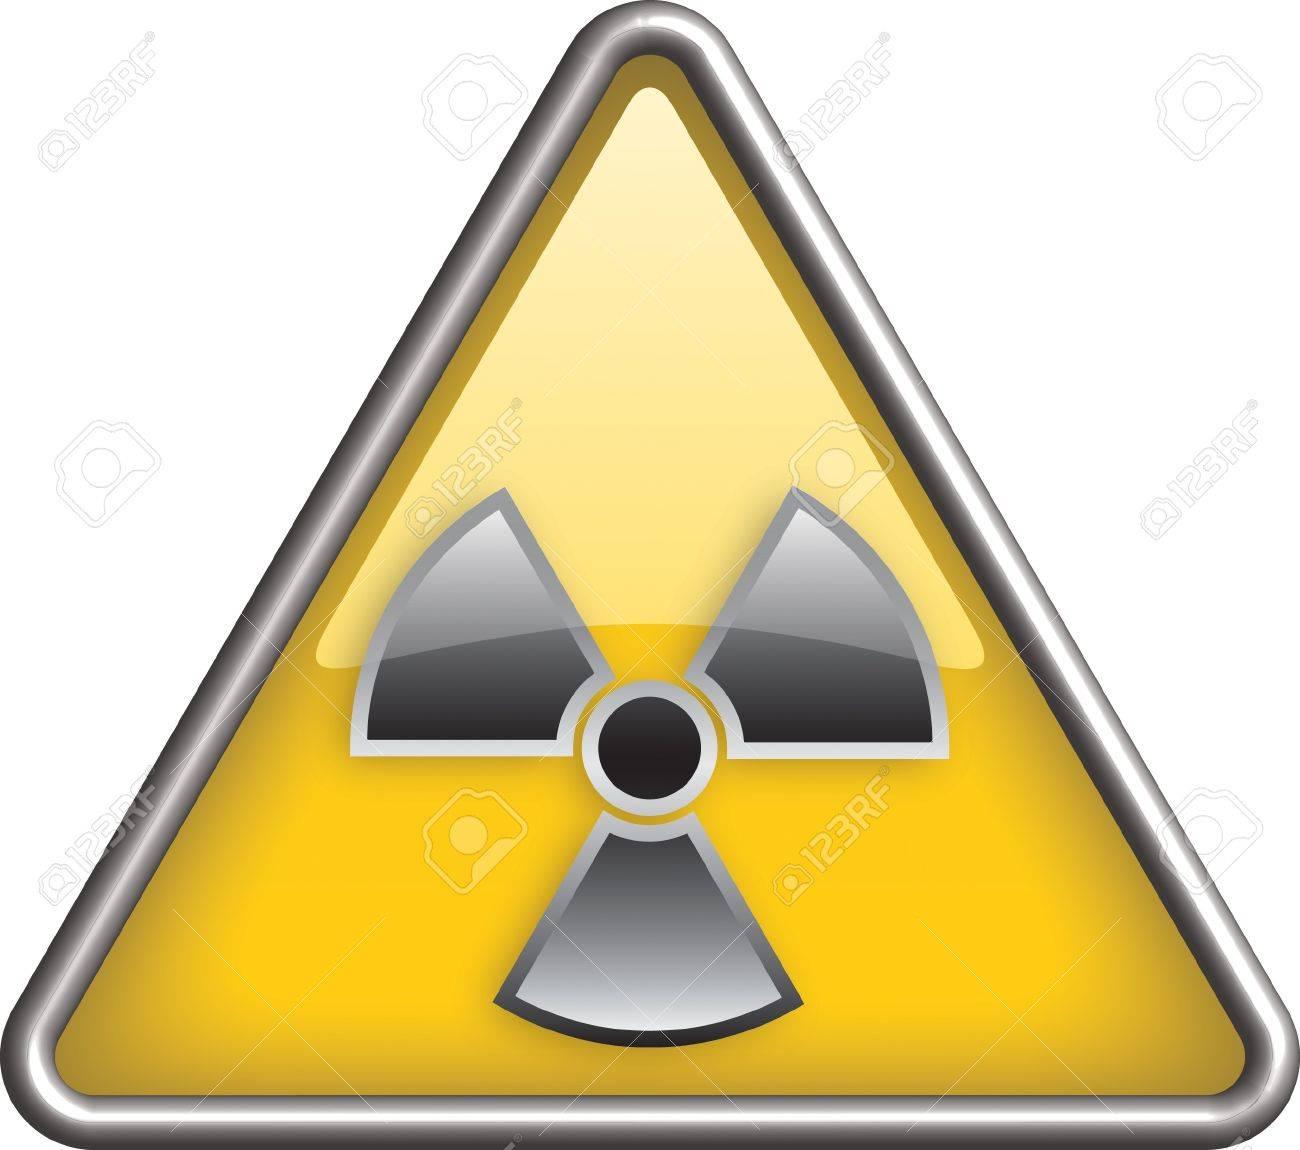 Radiation icon, hazard radiation icon in yellow triangle Stock Vector - 9165095